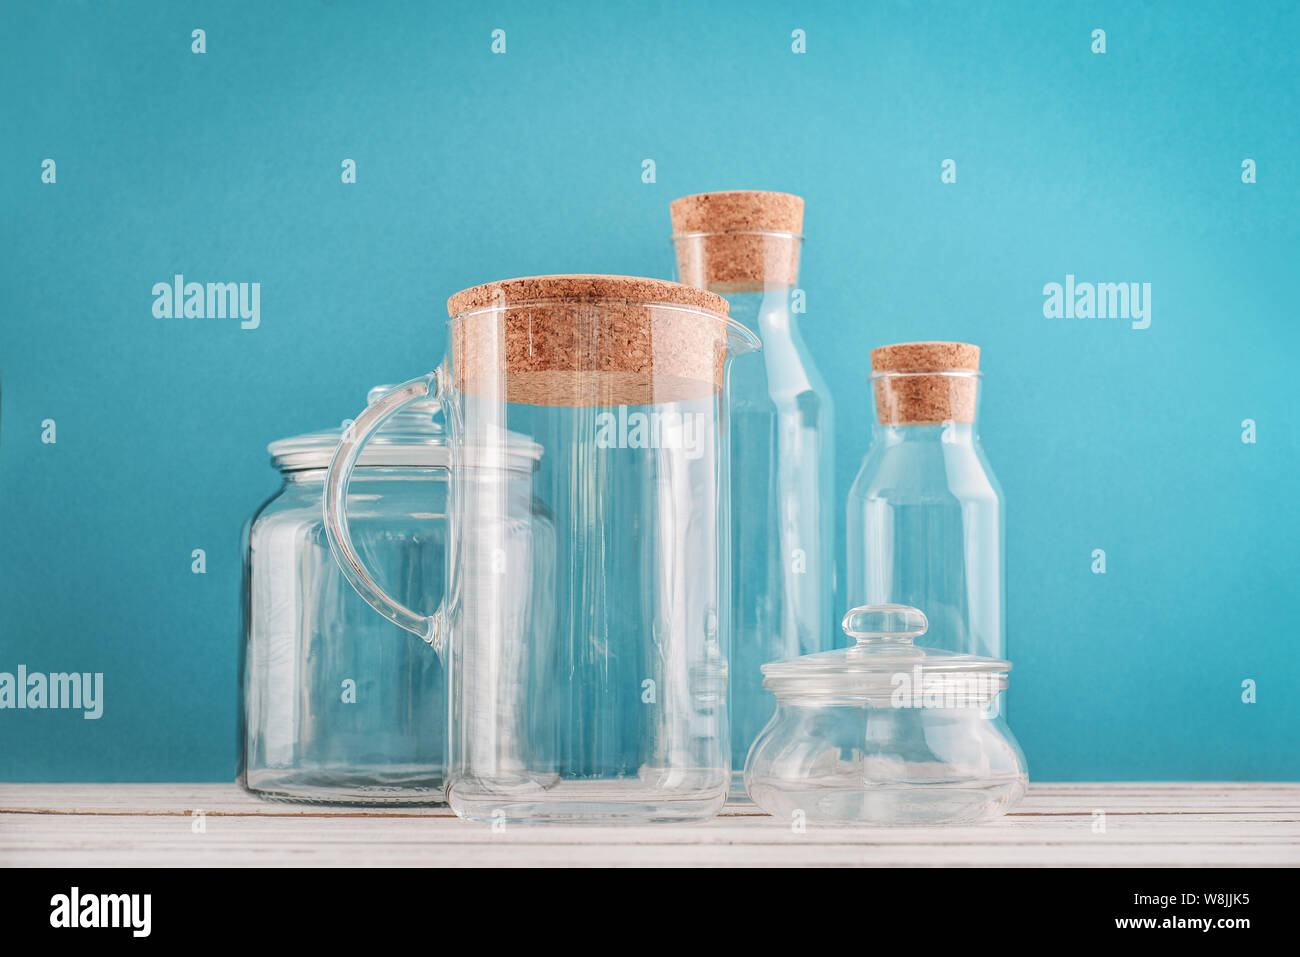 Glass Kitchen Utensils On Blue Background Closeup Stock